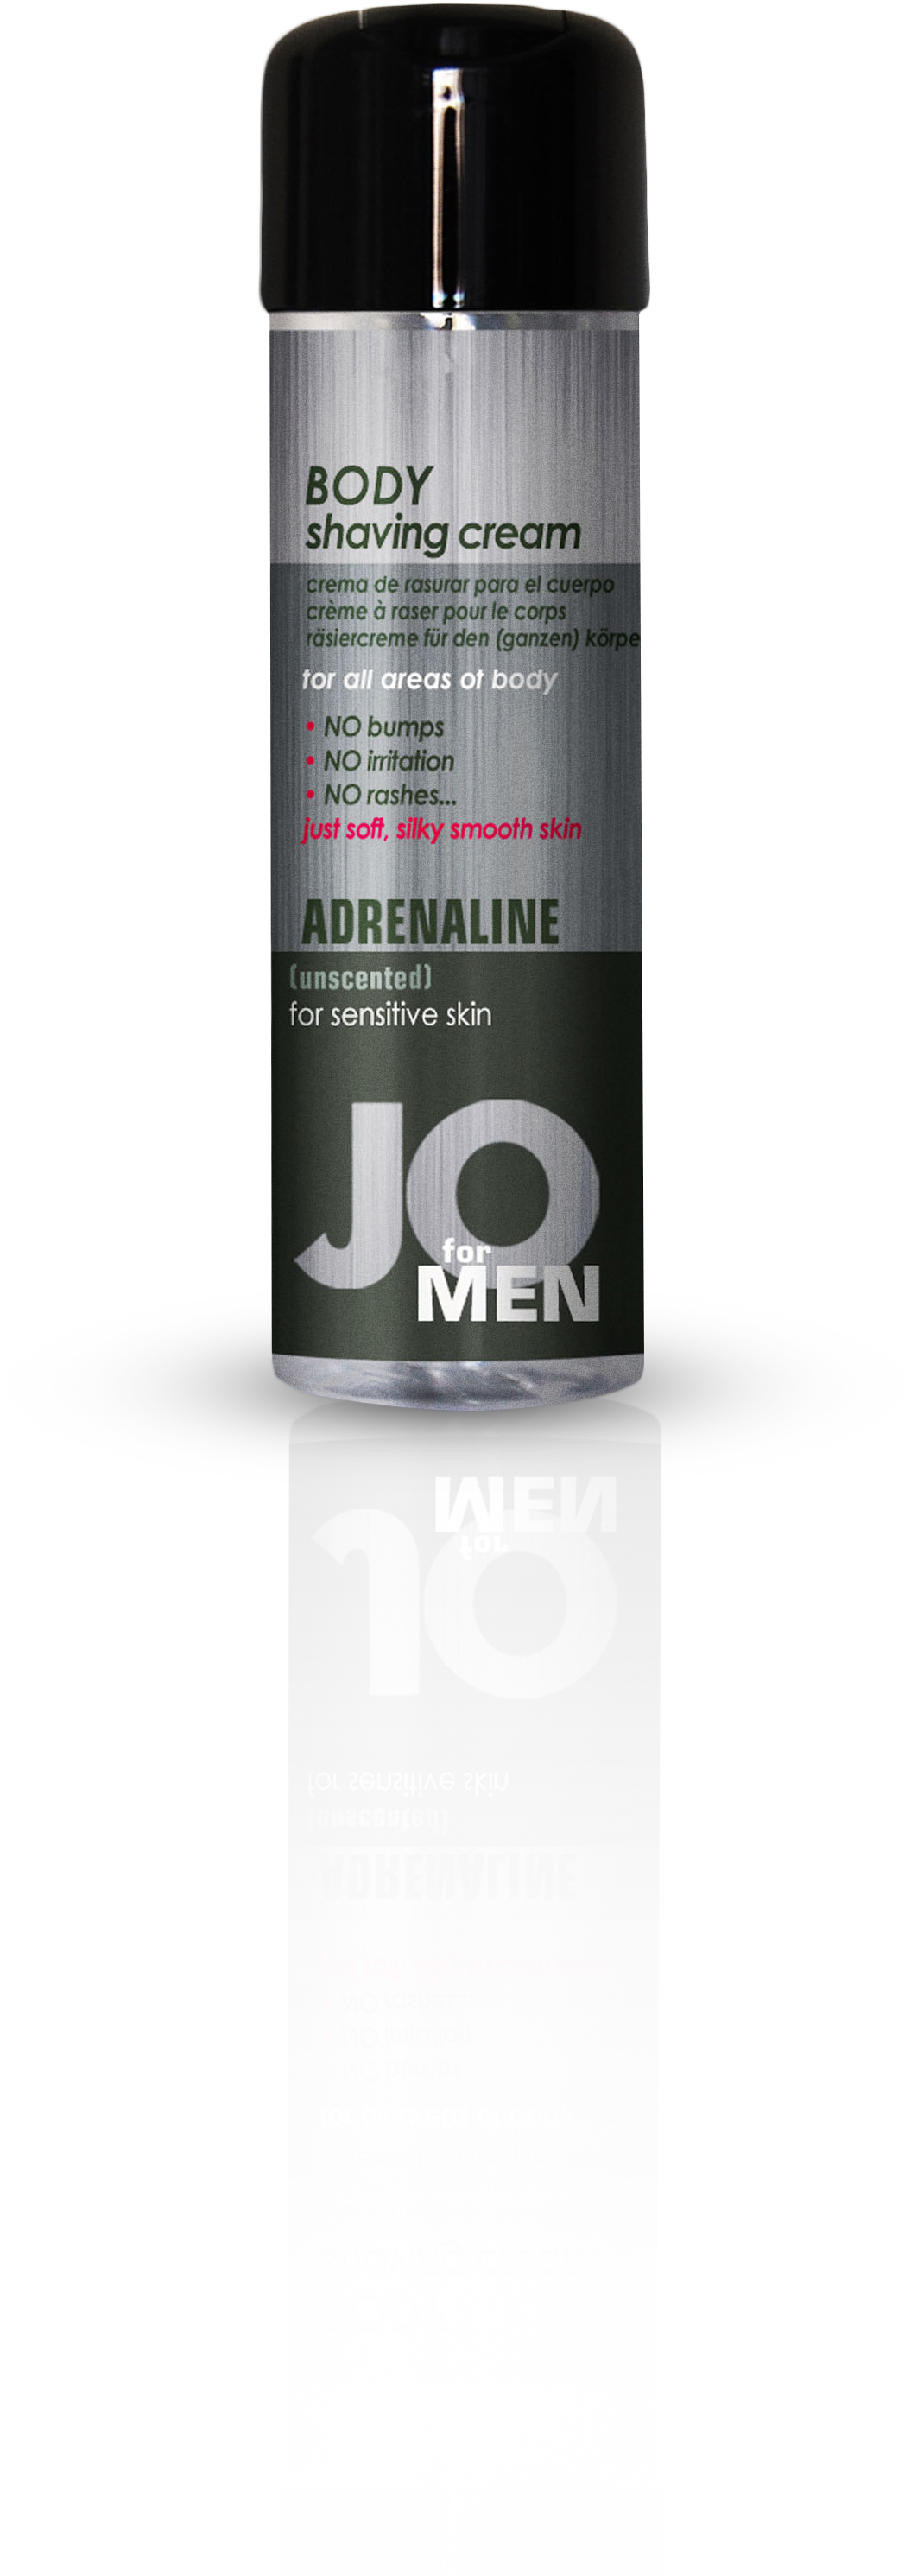 40177_JO ShaveCream_men_adrenaline_8oz.jpg